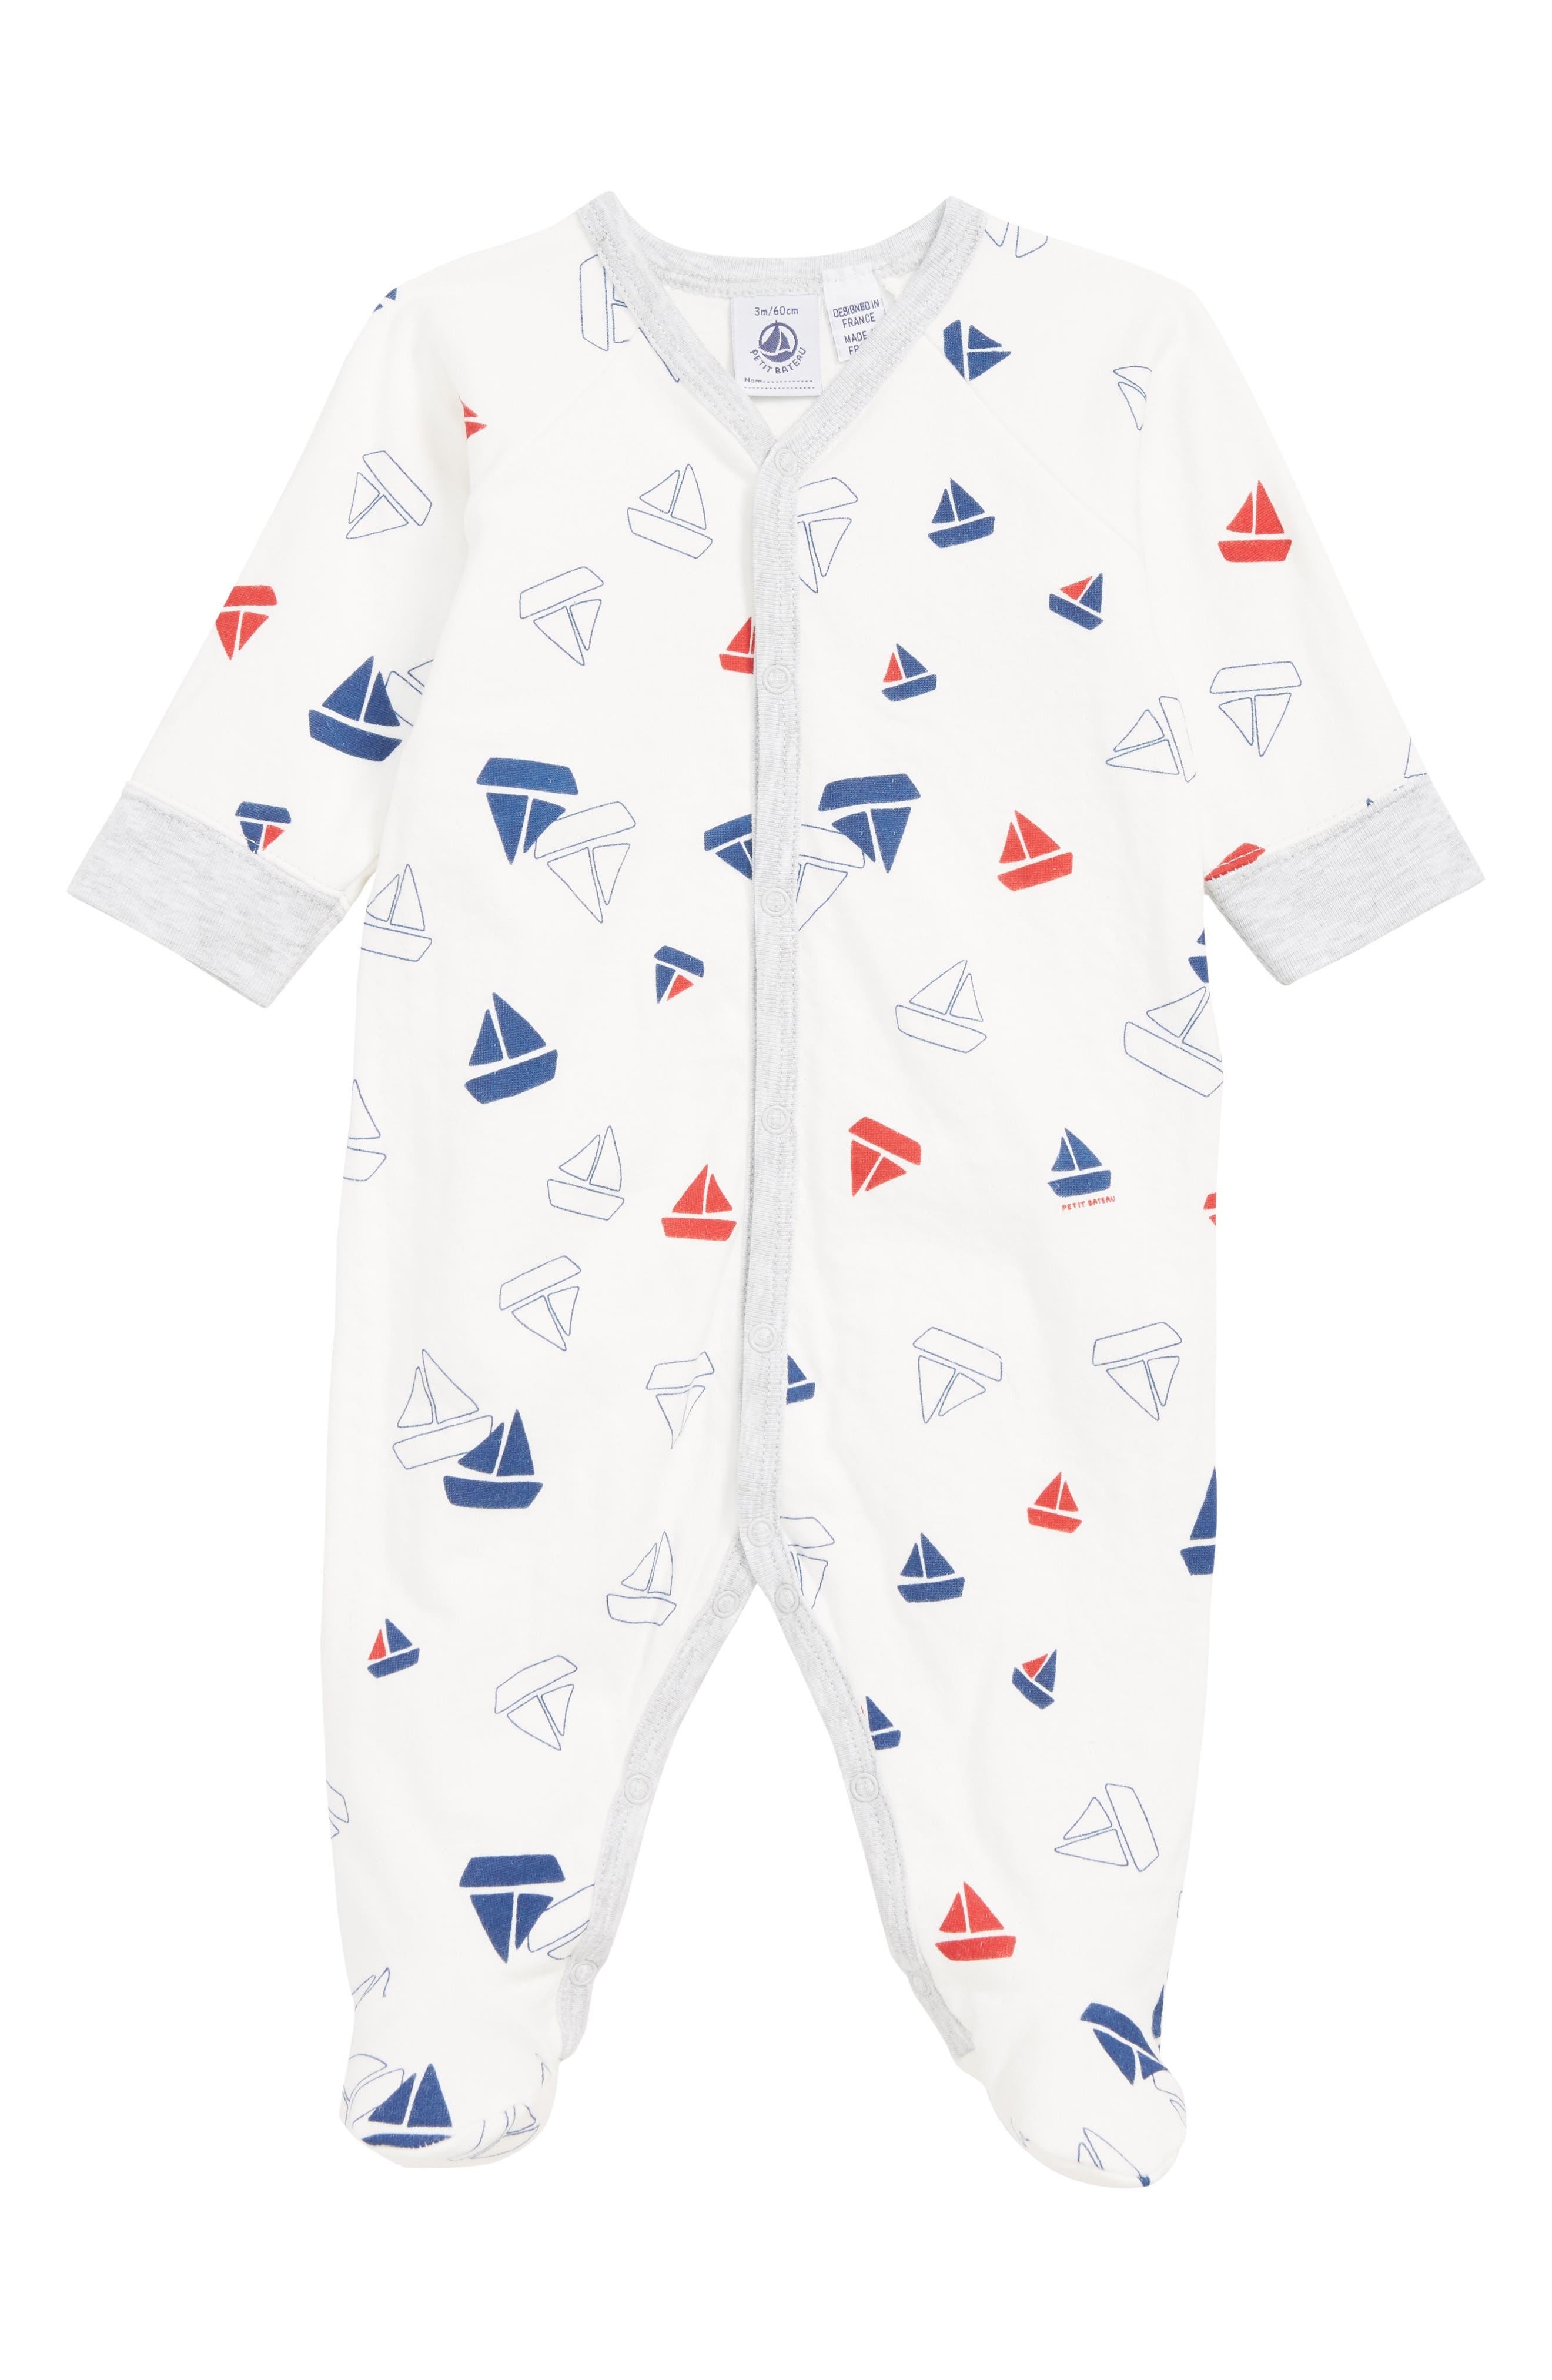 83477ded639 Petit Bateau Baby Items  Clothing